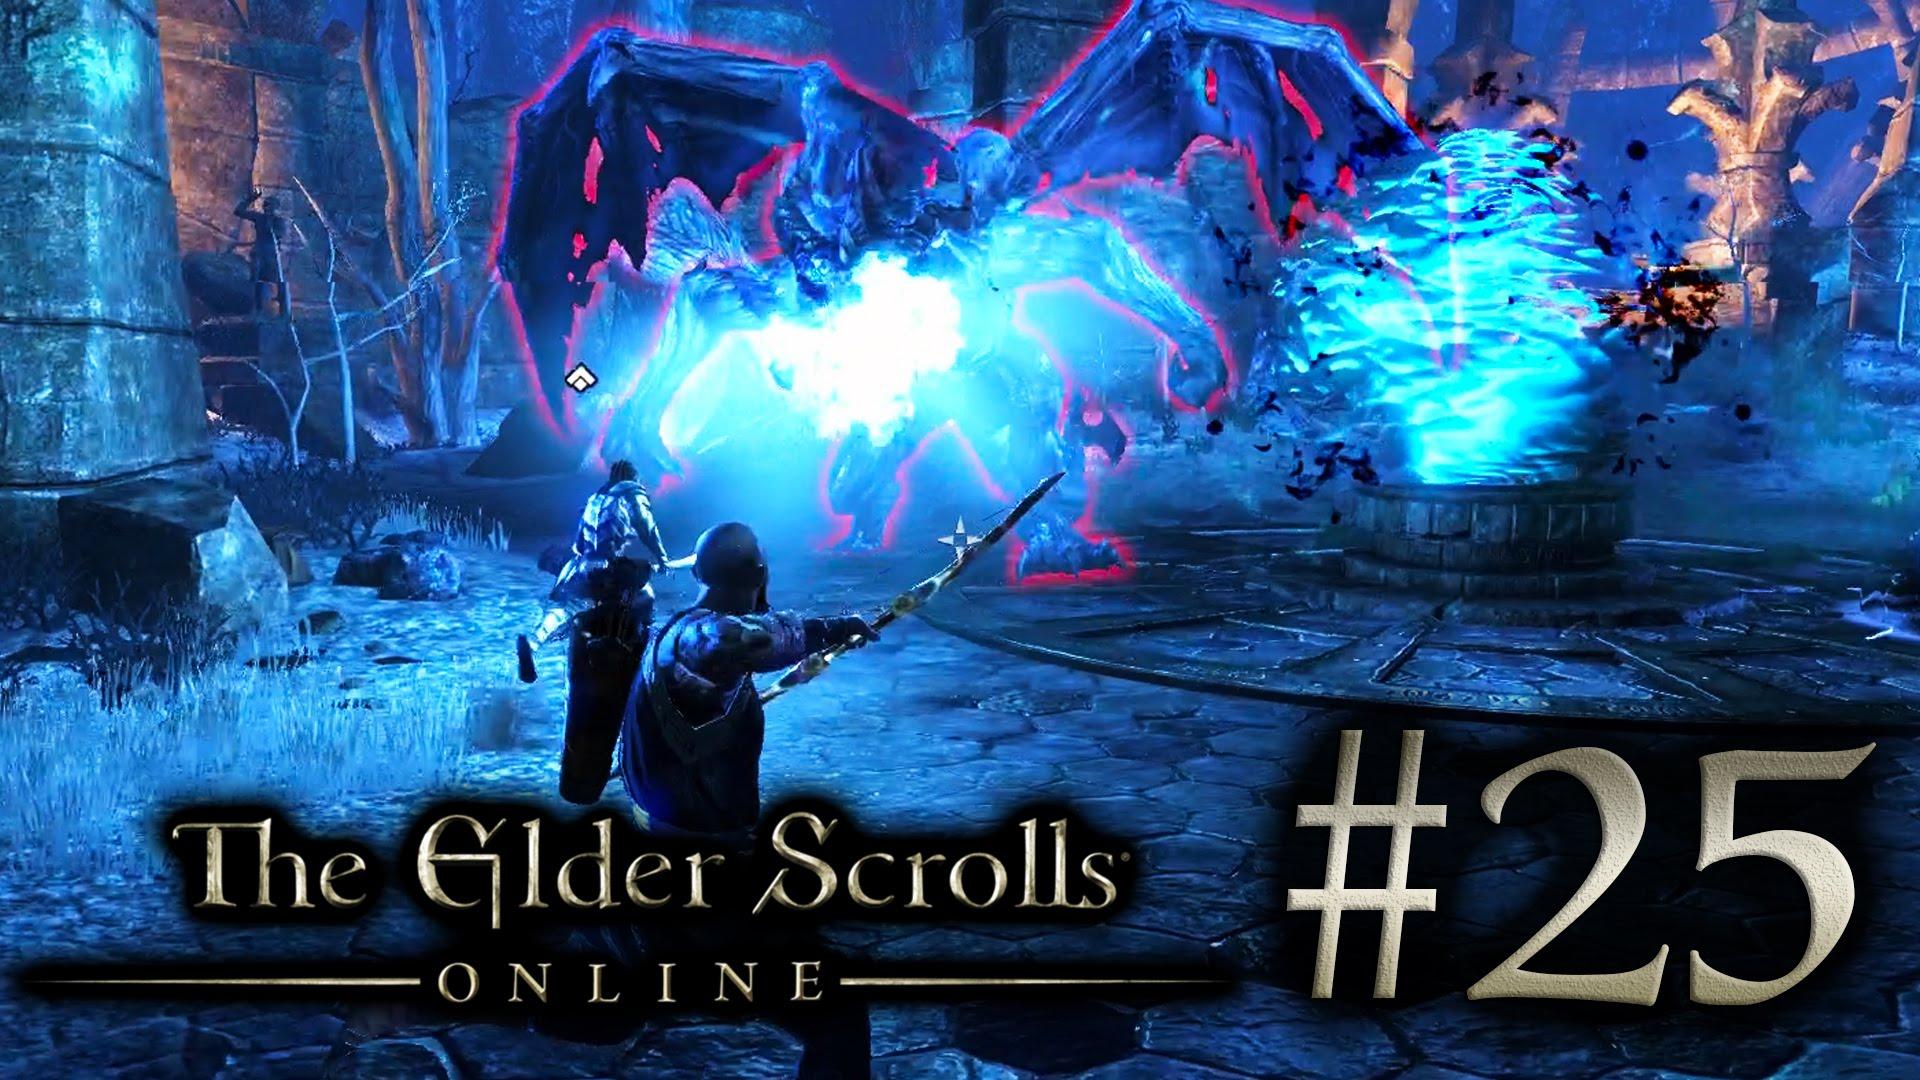 #25 The Elder Scrolls Online [エルダー・スクロールズ・オンライン]